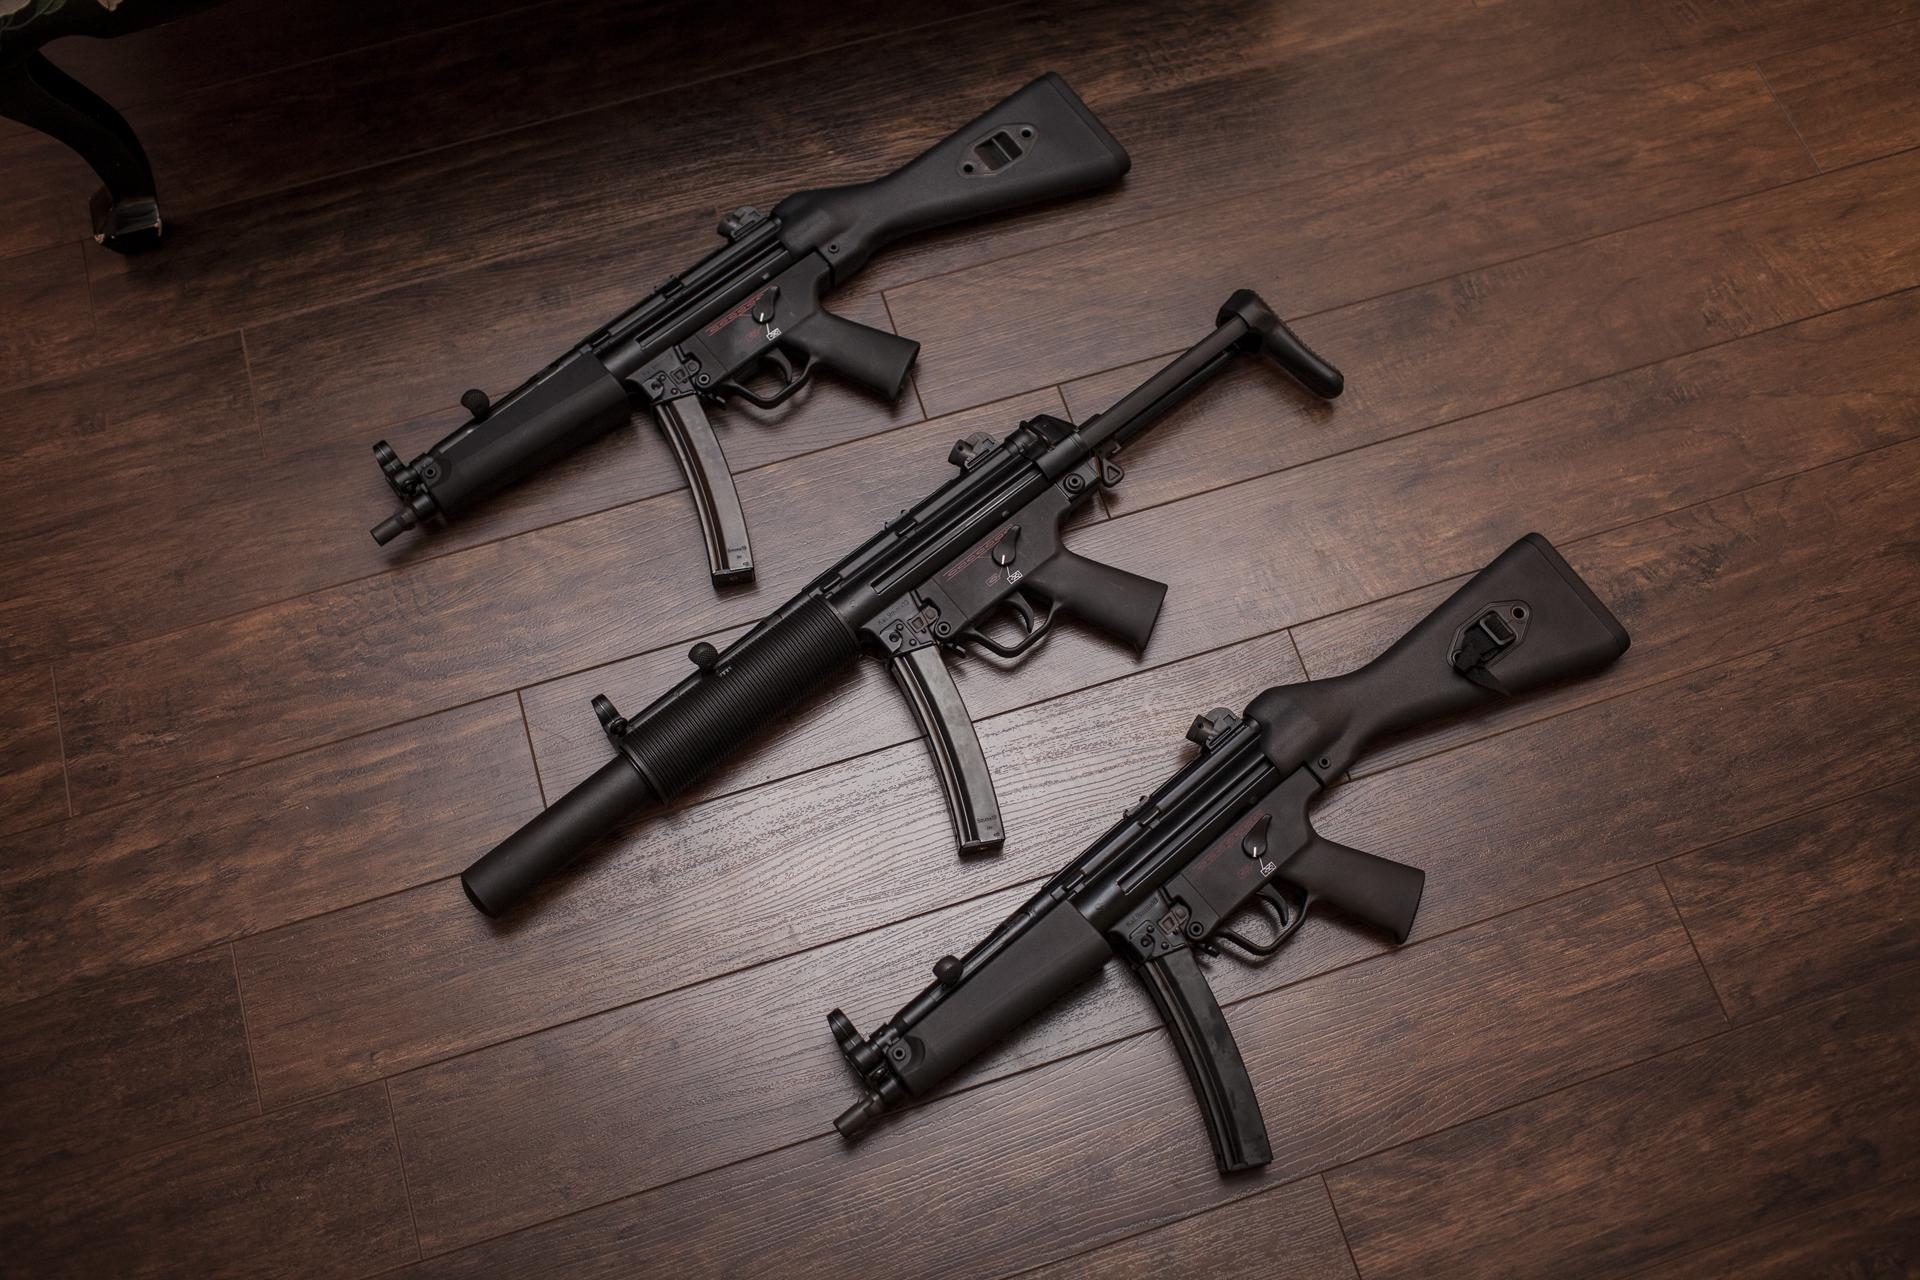 VFC (UMAREX) MP5 GBBR Owners Thread - Airsoft Canada